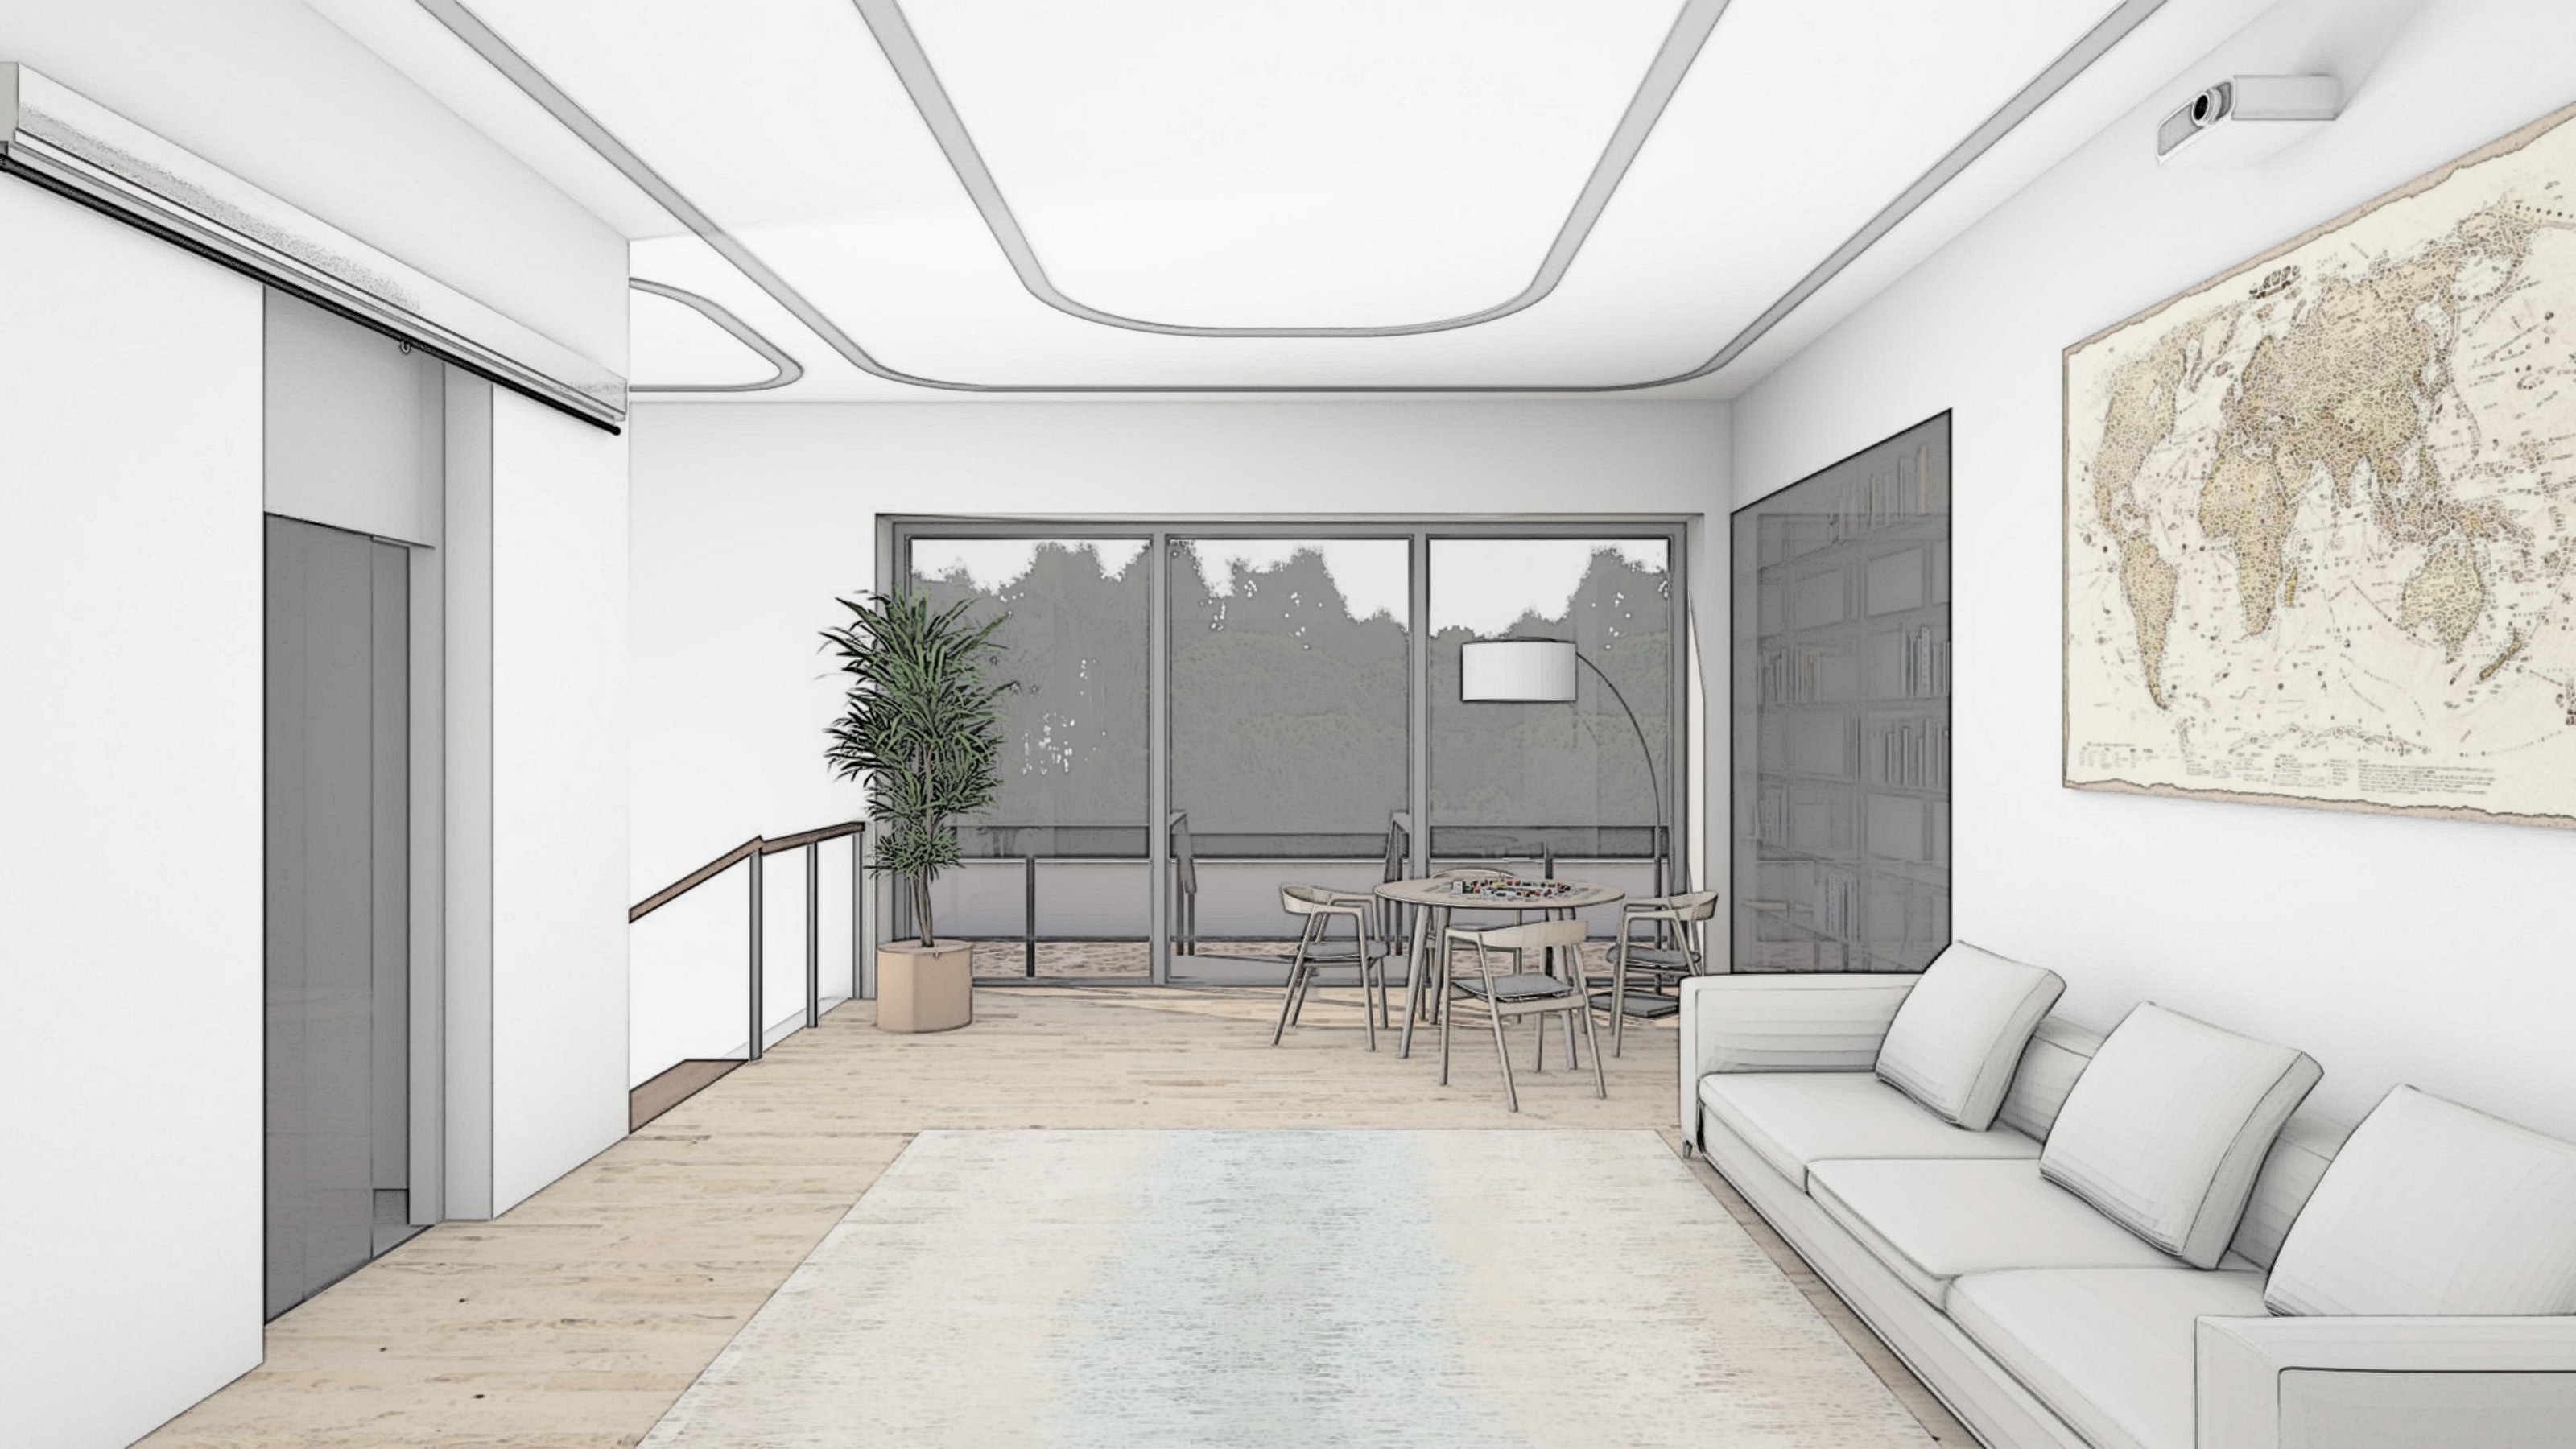 Изображение для проекта Проект особняка в Латвии в стиле модерн 2903